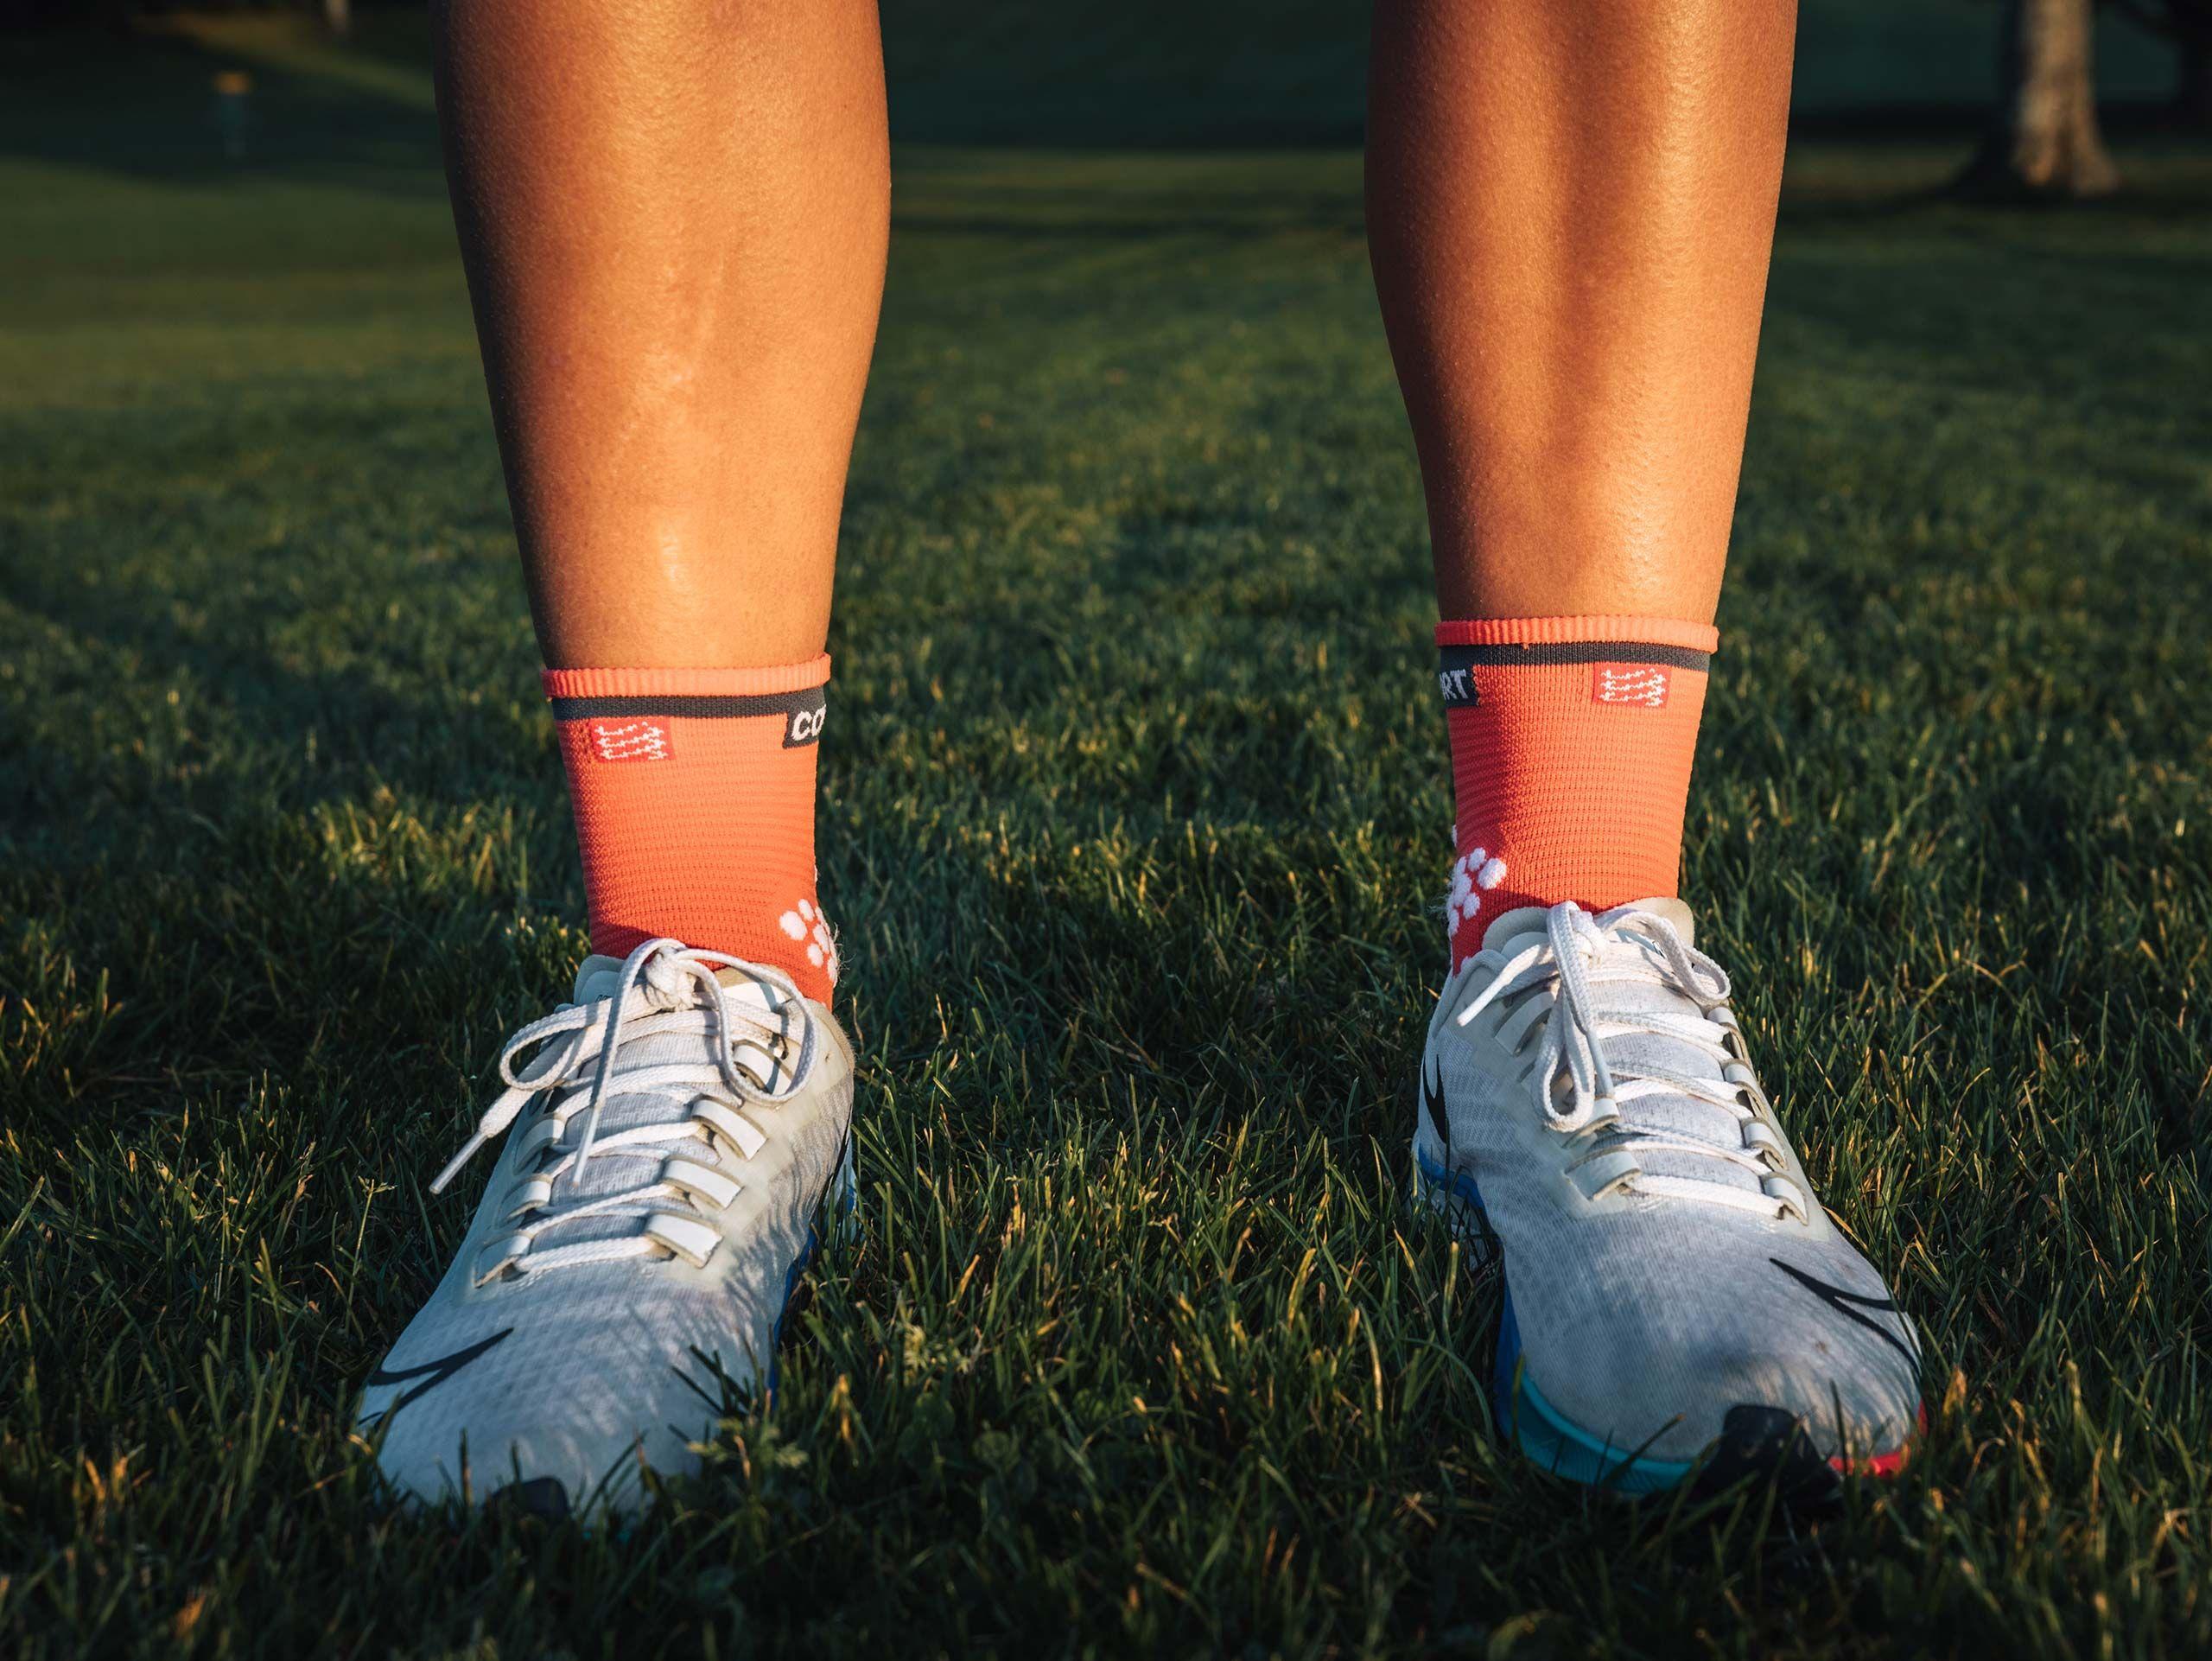 Pro racing socks v3.0 Run high coral